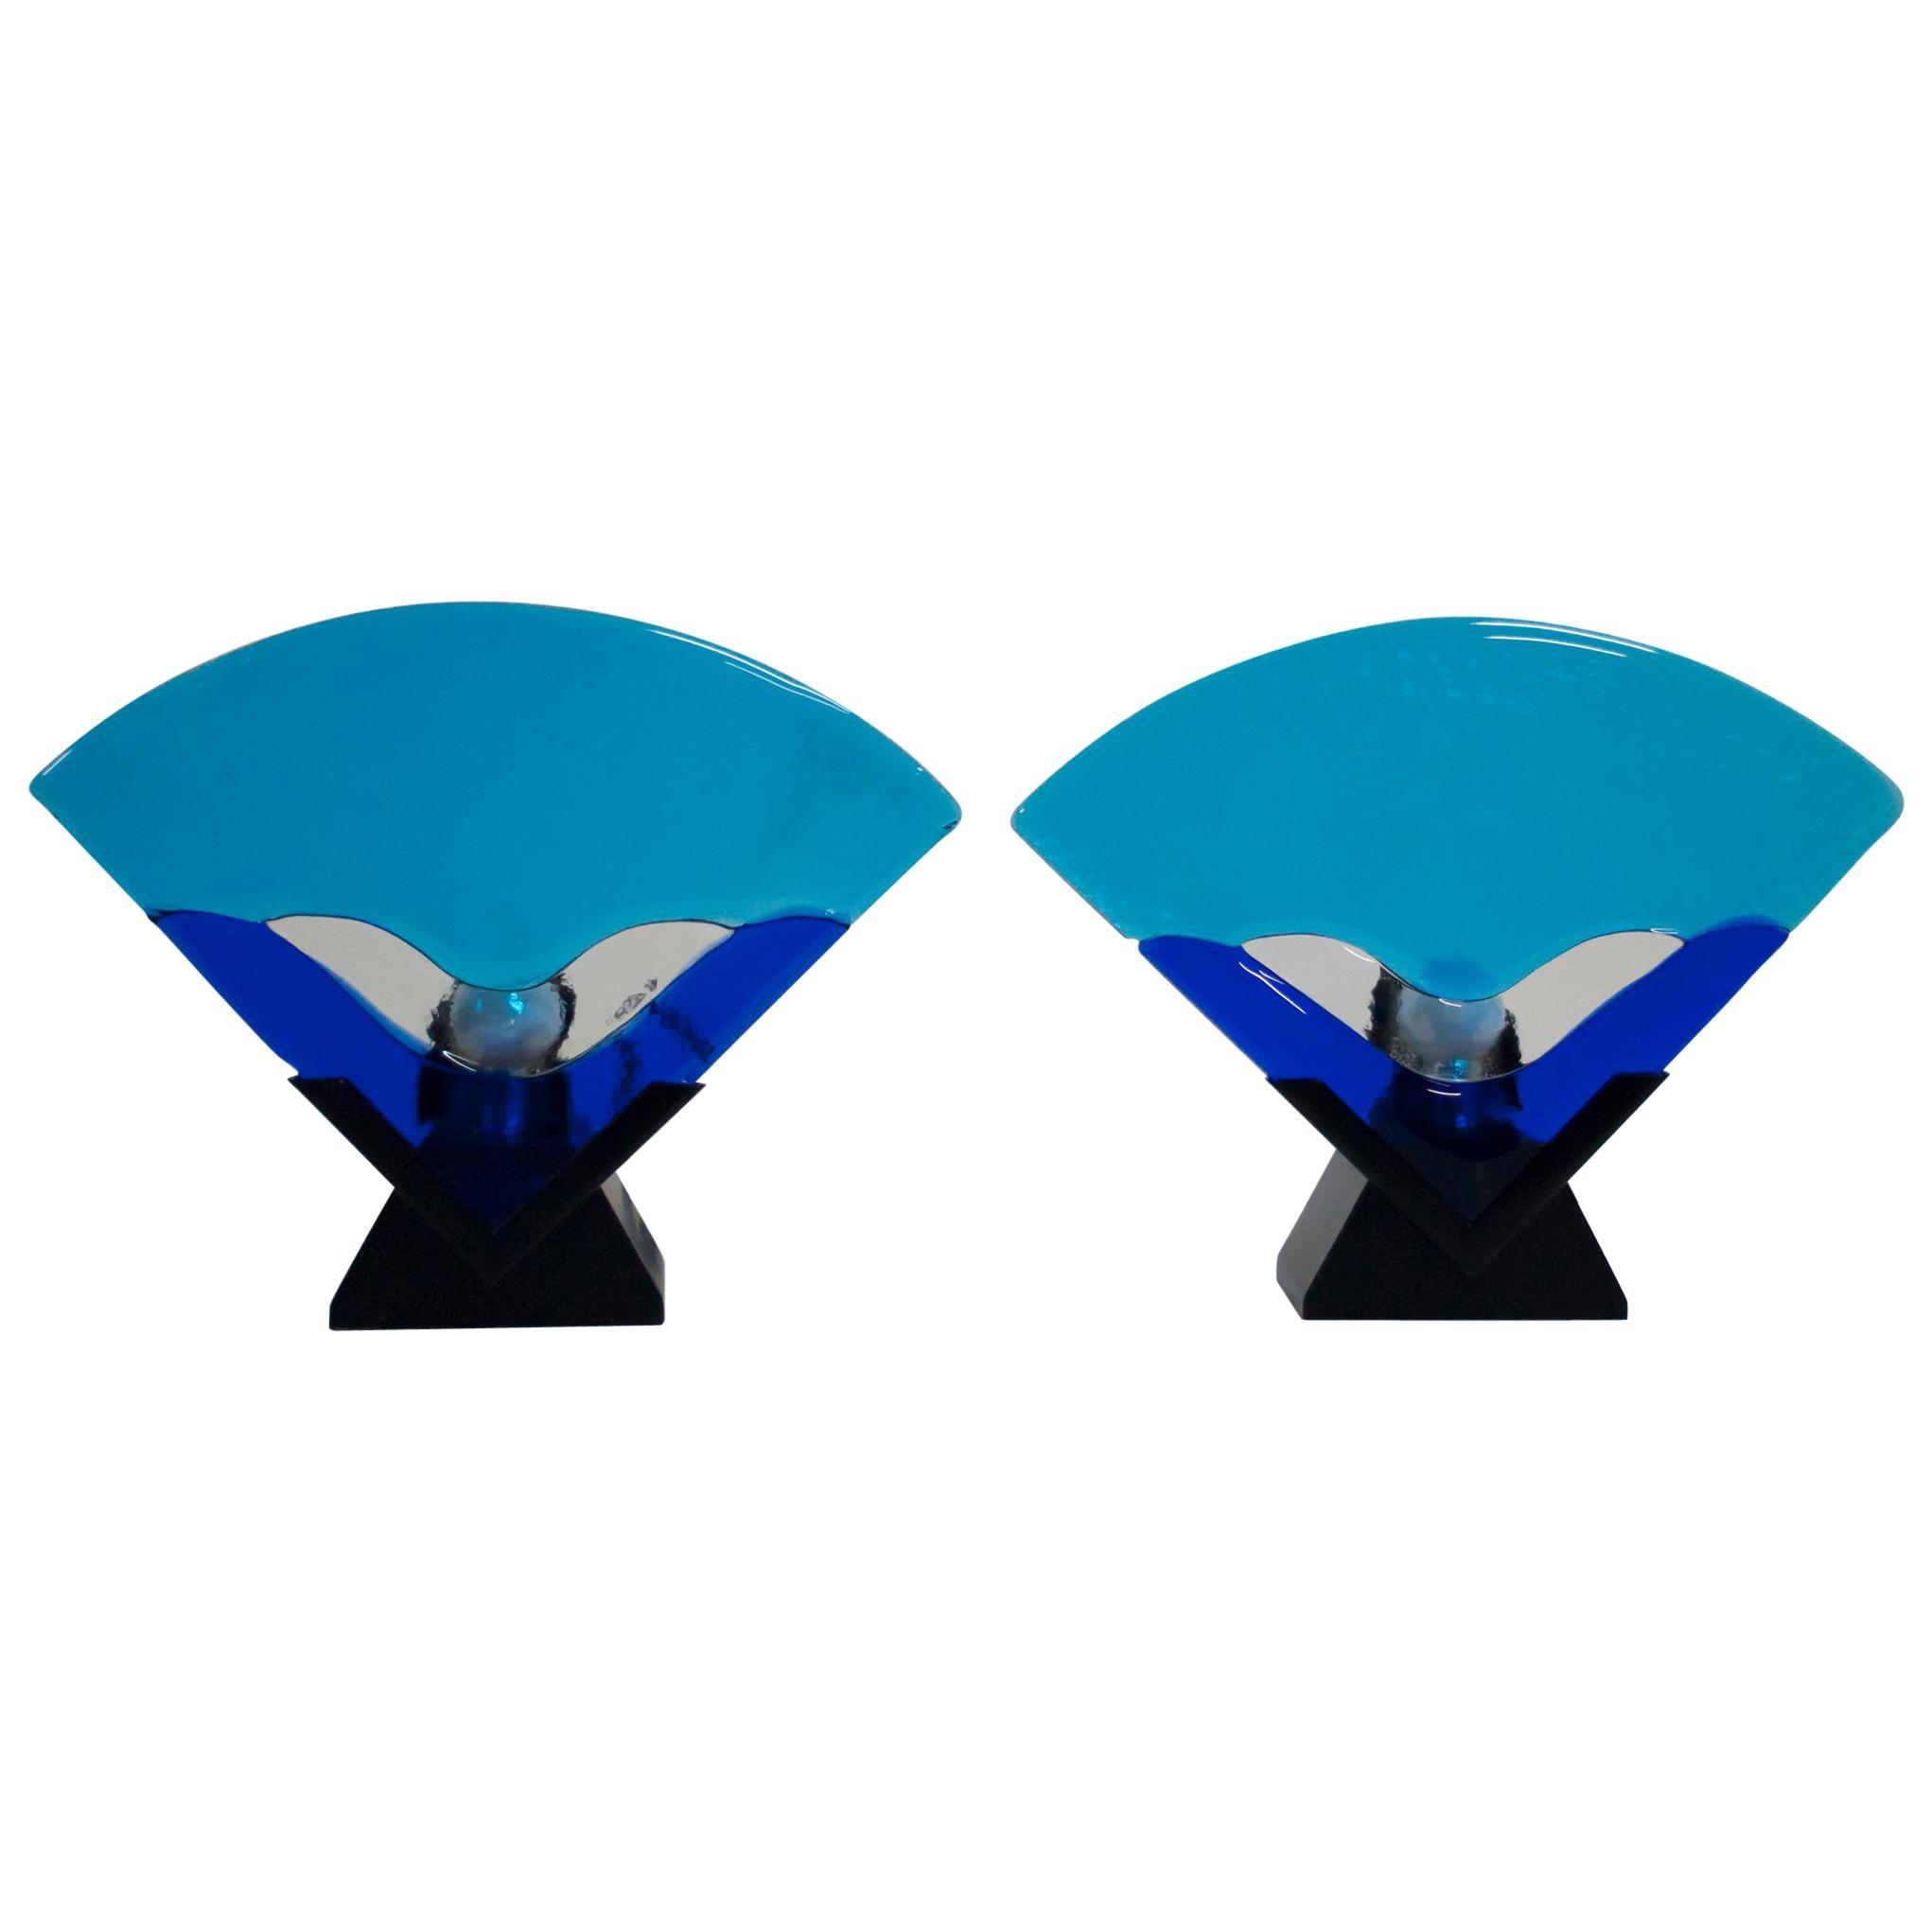 Pair of Modern Italian Murano Glass Table Lamps, 1980